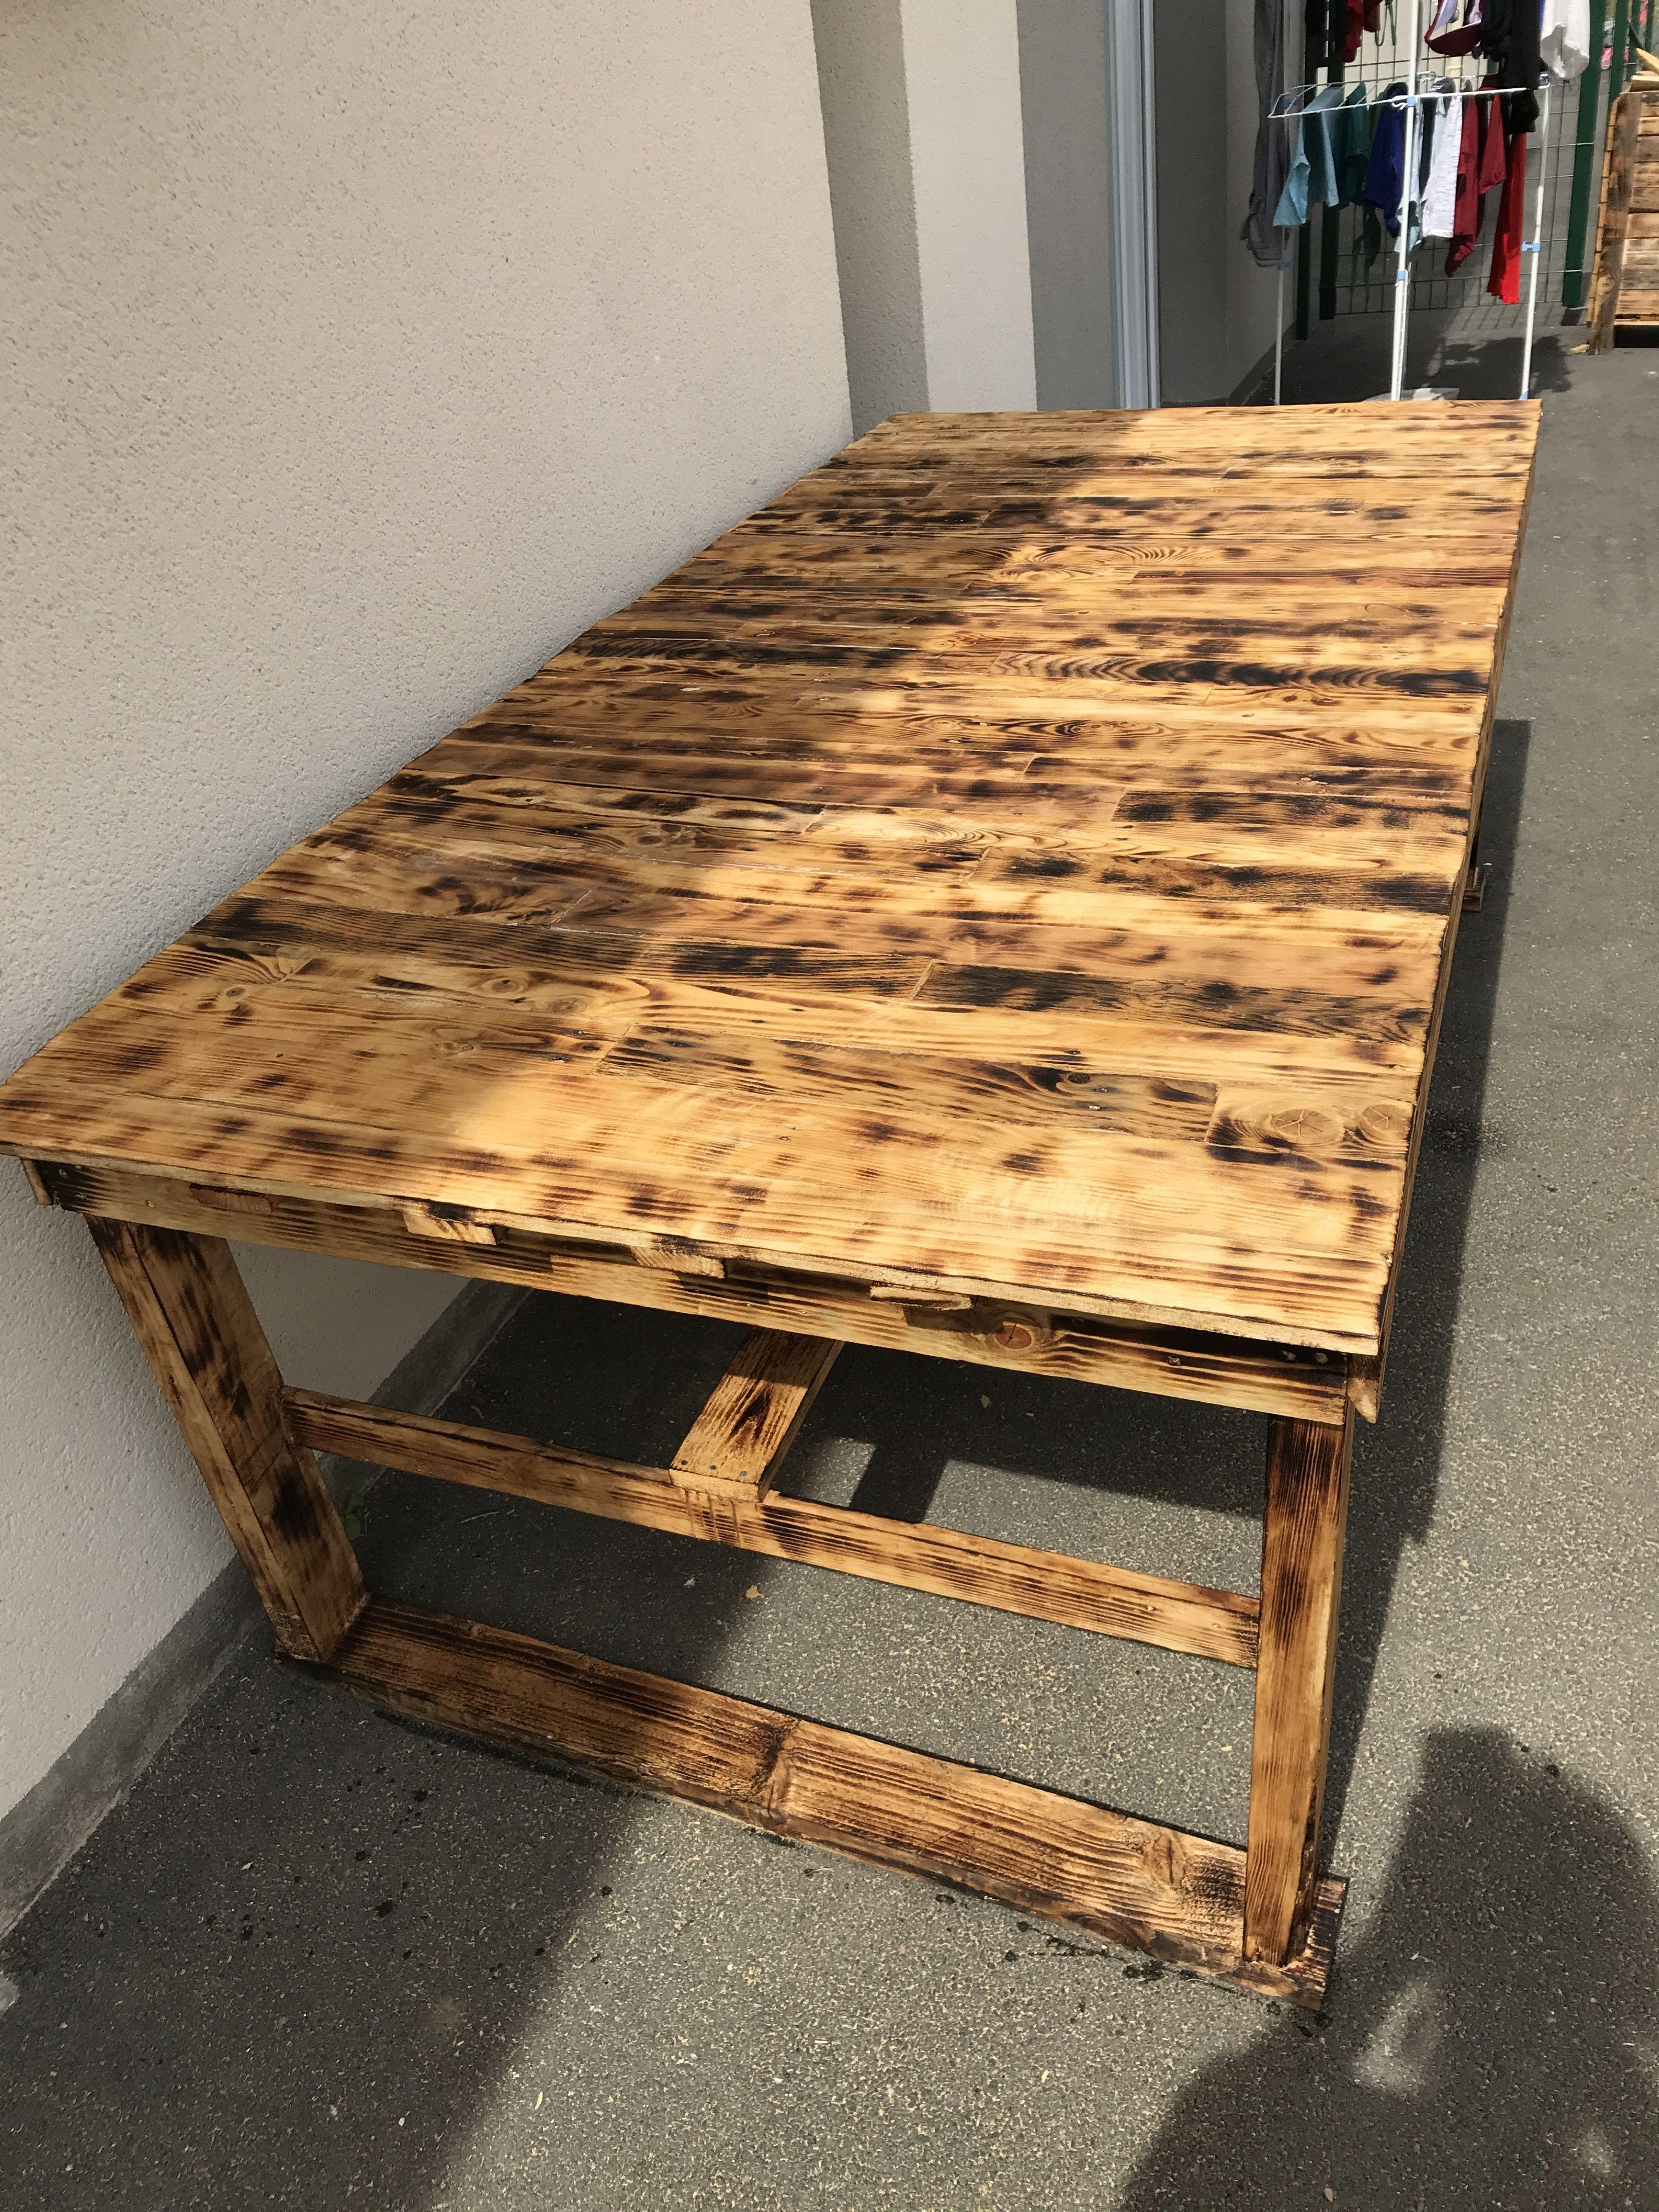 Normal Studio Stoco Blister Coffee Table En Bois Brule Bois Brule Bois Table Basse D Appoint